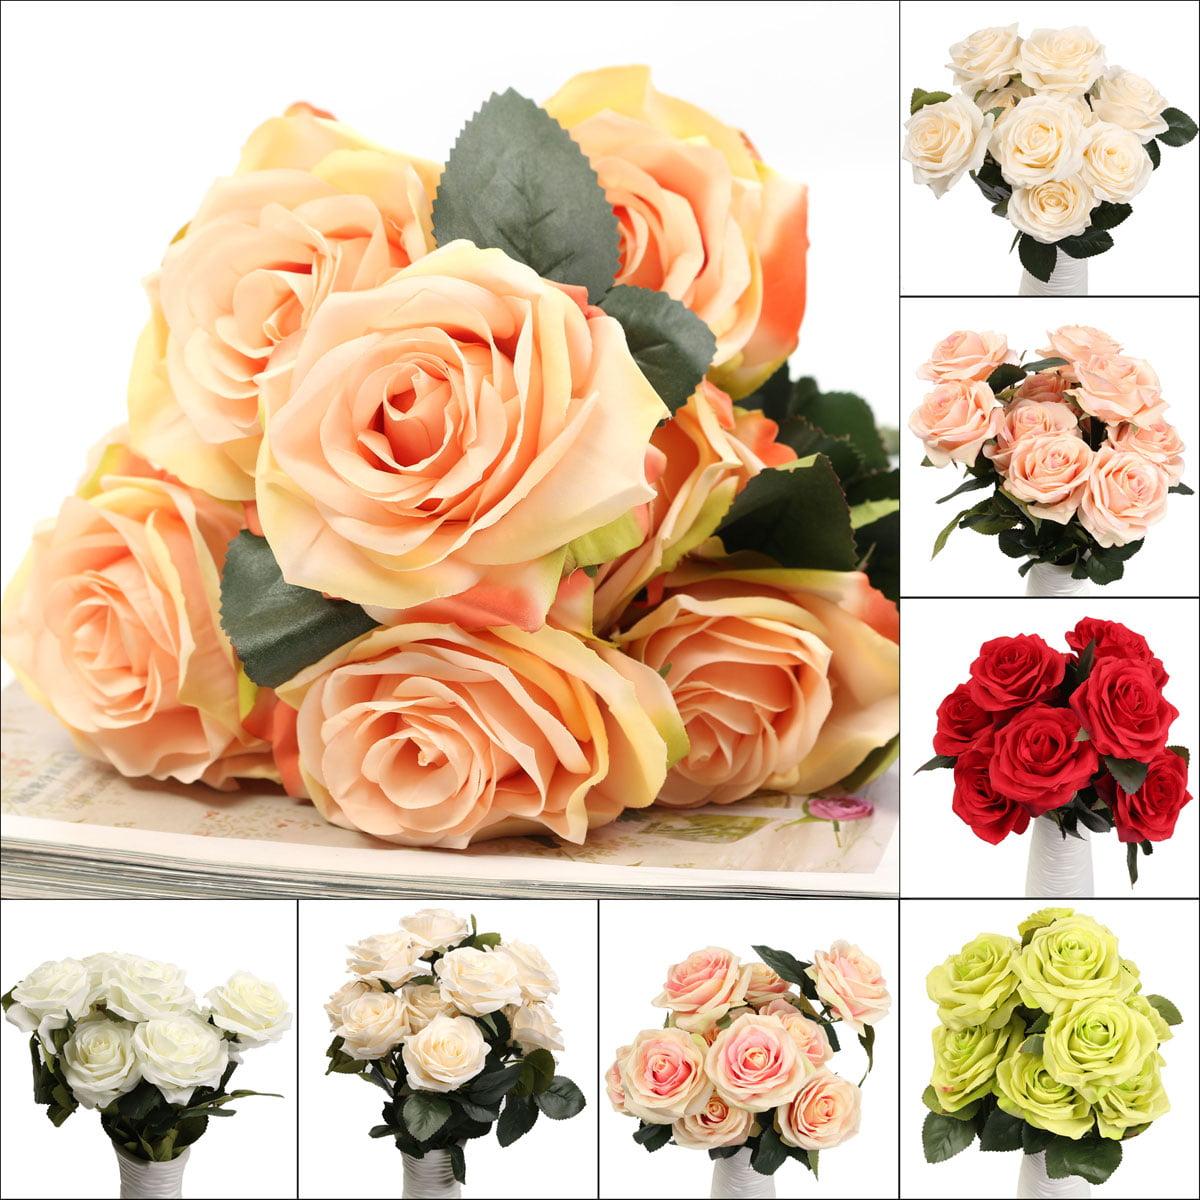 10 Head 1 BouquetAartificial Rose Flower Fake Silk Rose Flower Home Room Artificial Flowers Wedding Party Decor